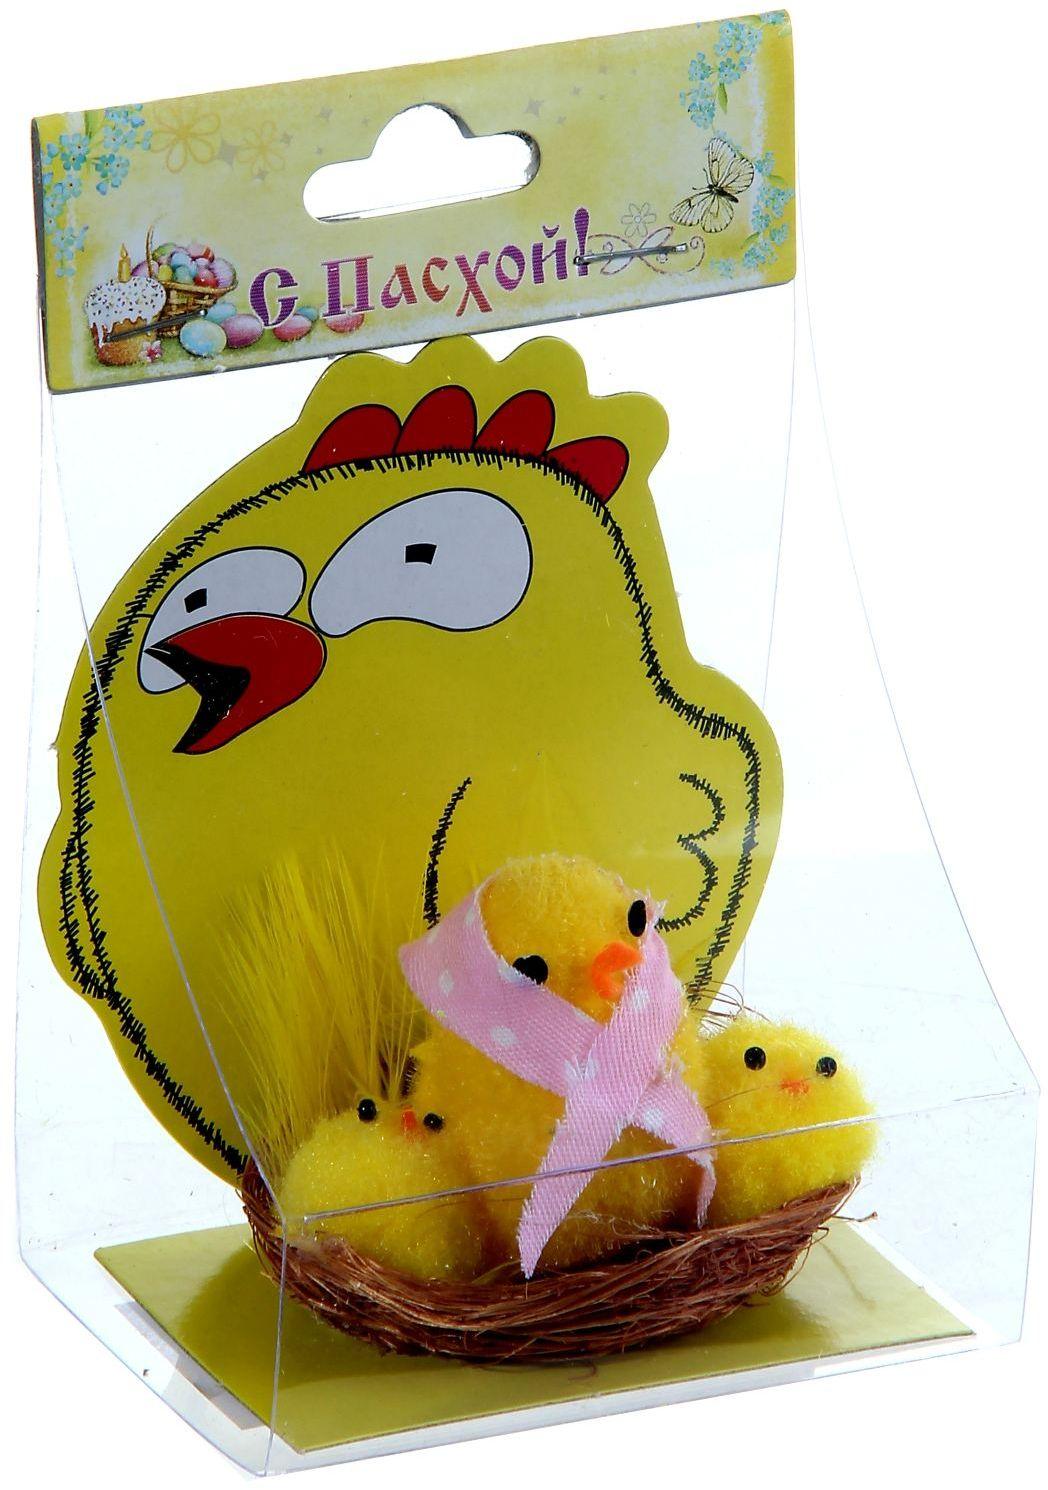 Сувенир пасхальный Sima-land Цыпа и два цыпленка, 4 х 5 х 4 см сувенир пасхальный sima land яйцо горошек 4 х 4 х 6 см 6 шт